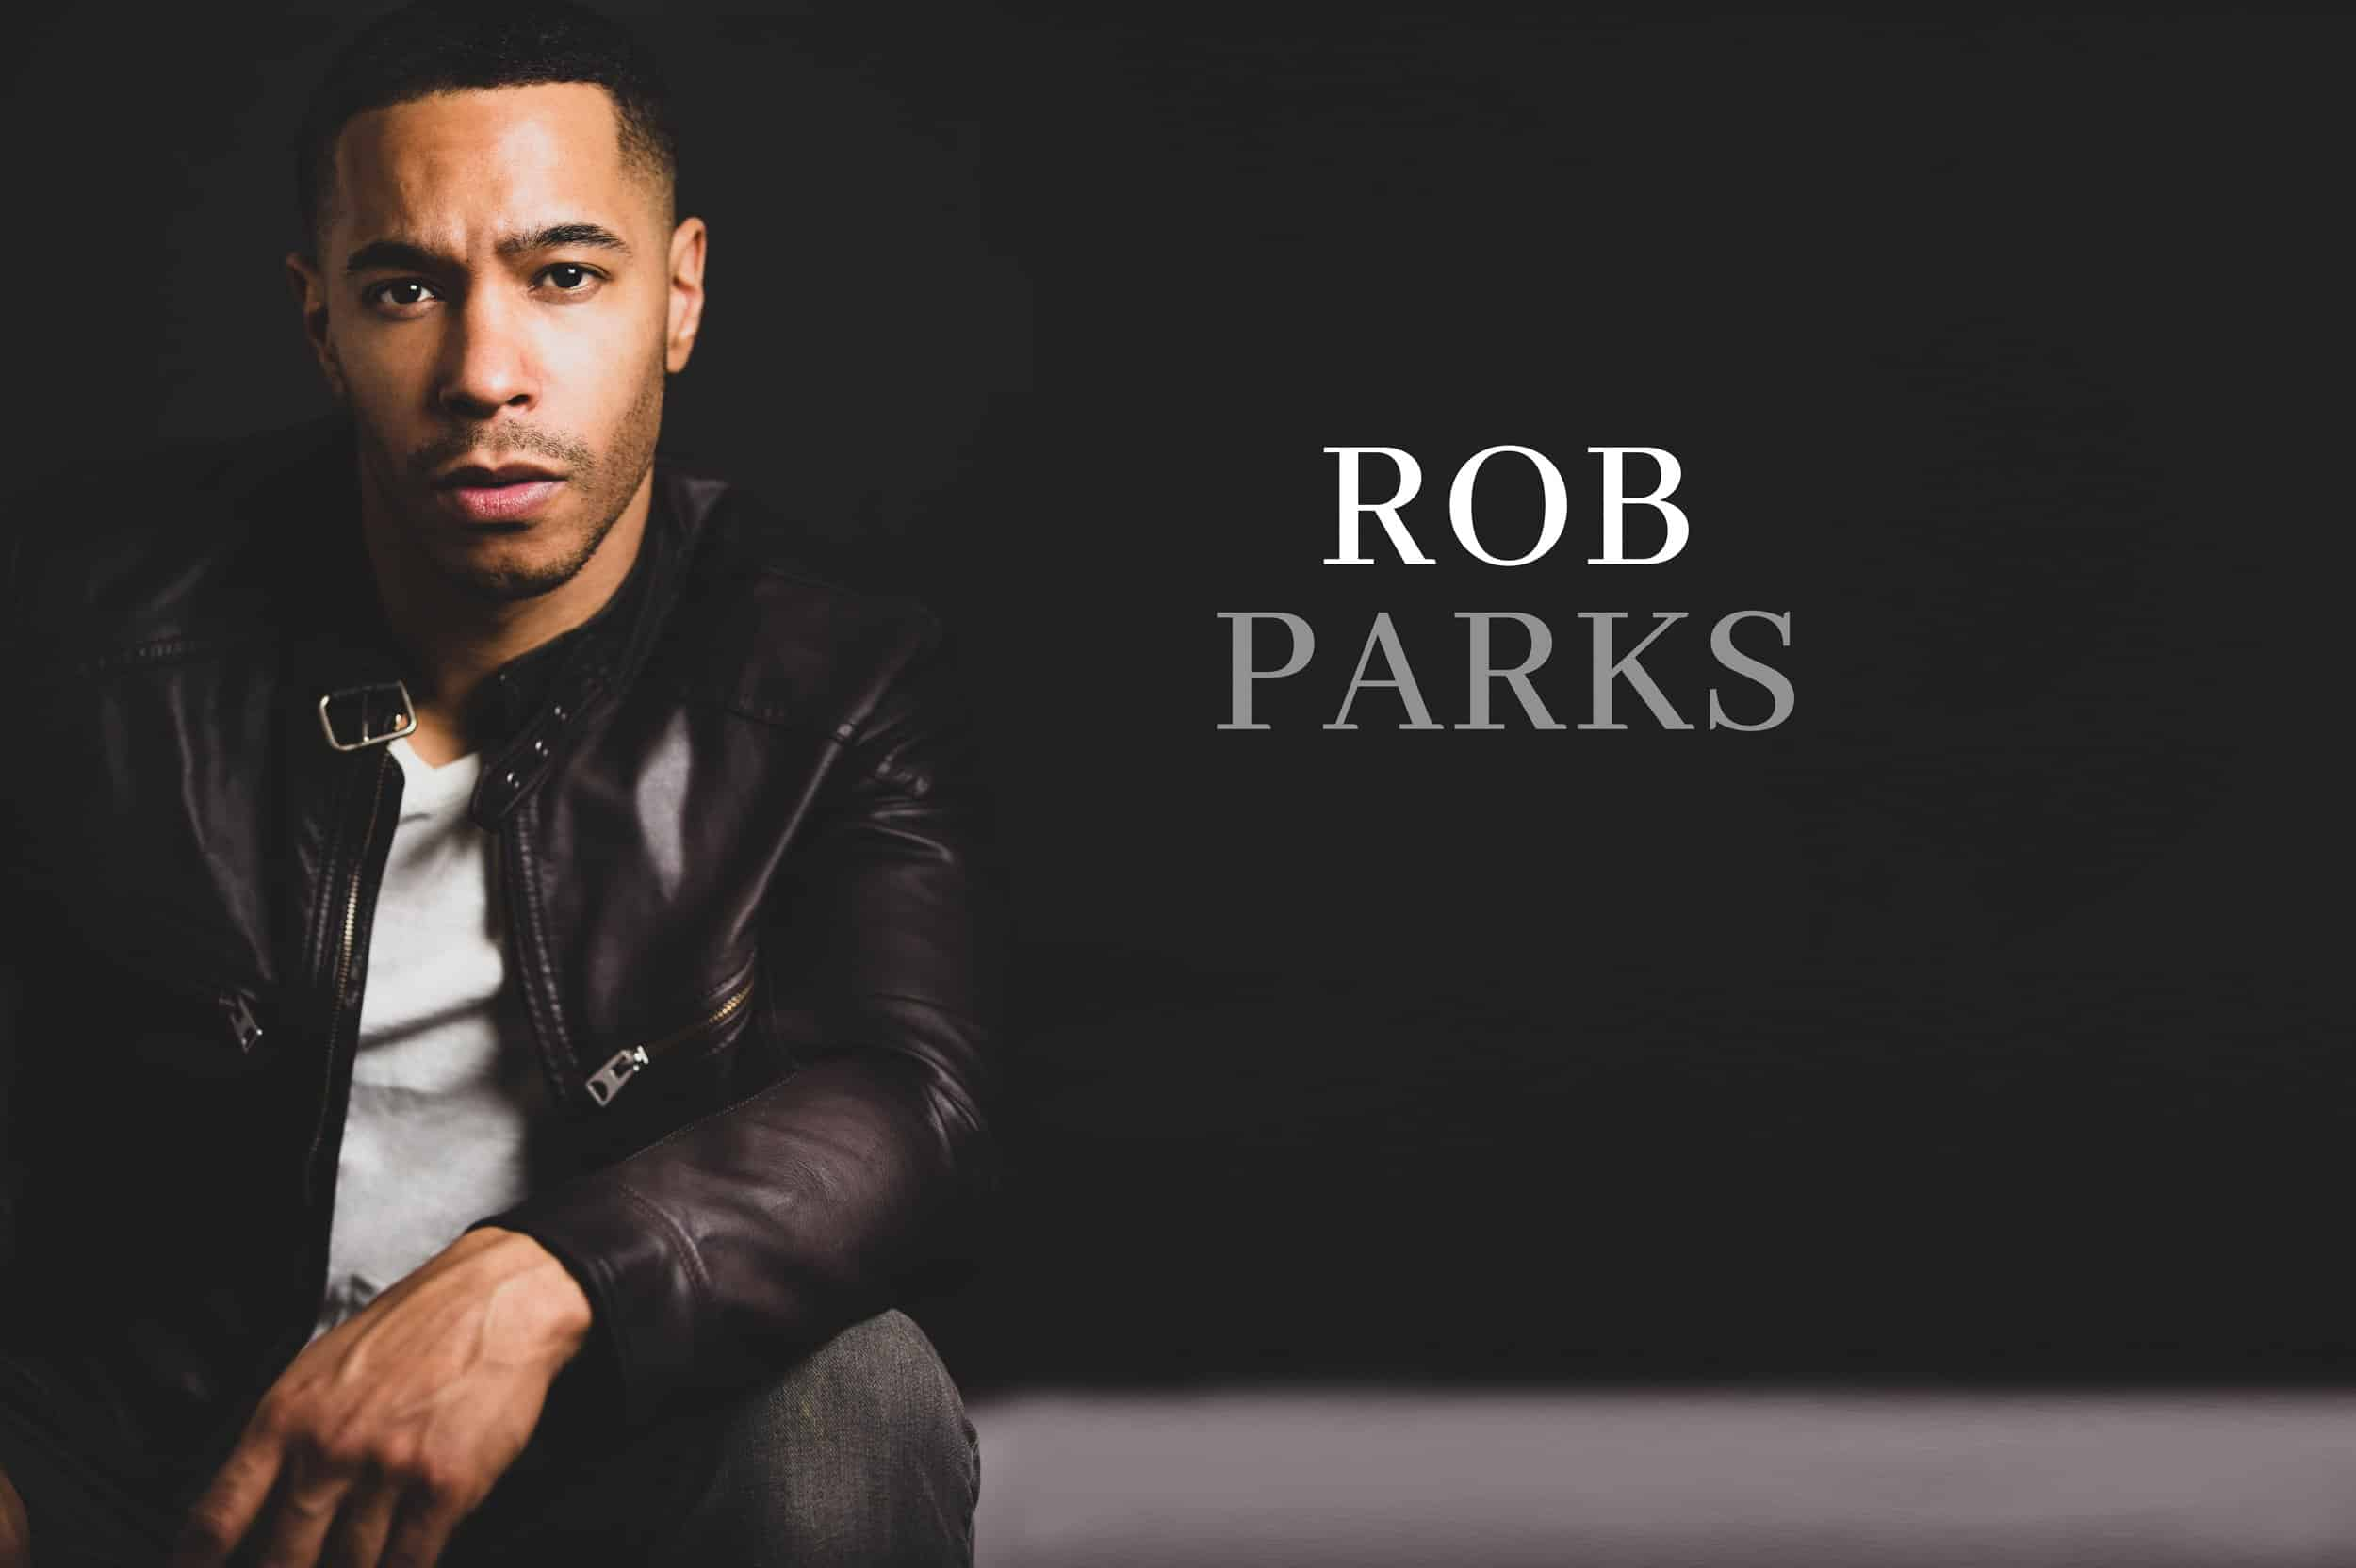 Rob Parks